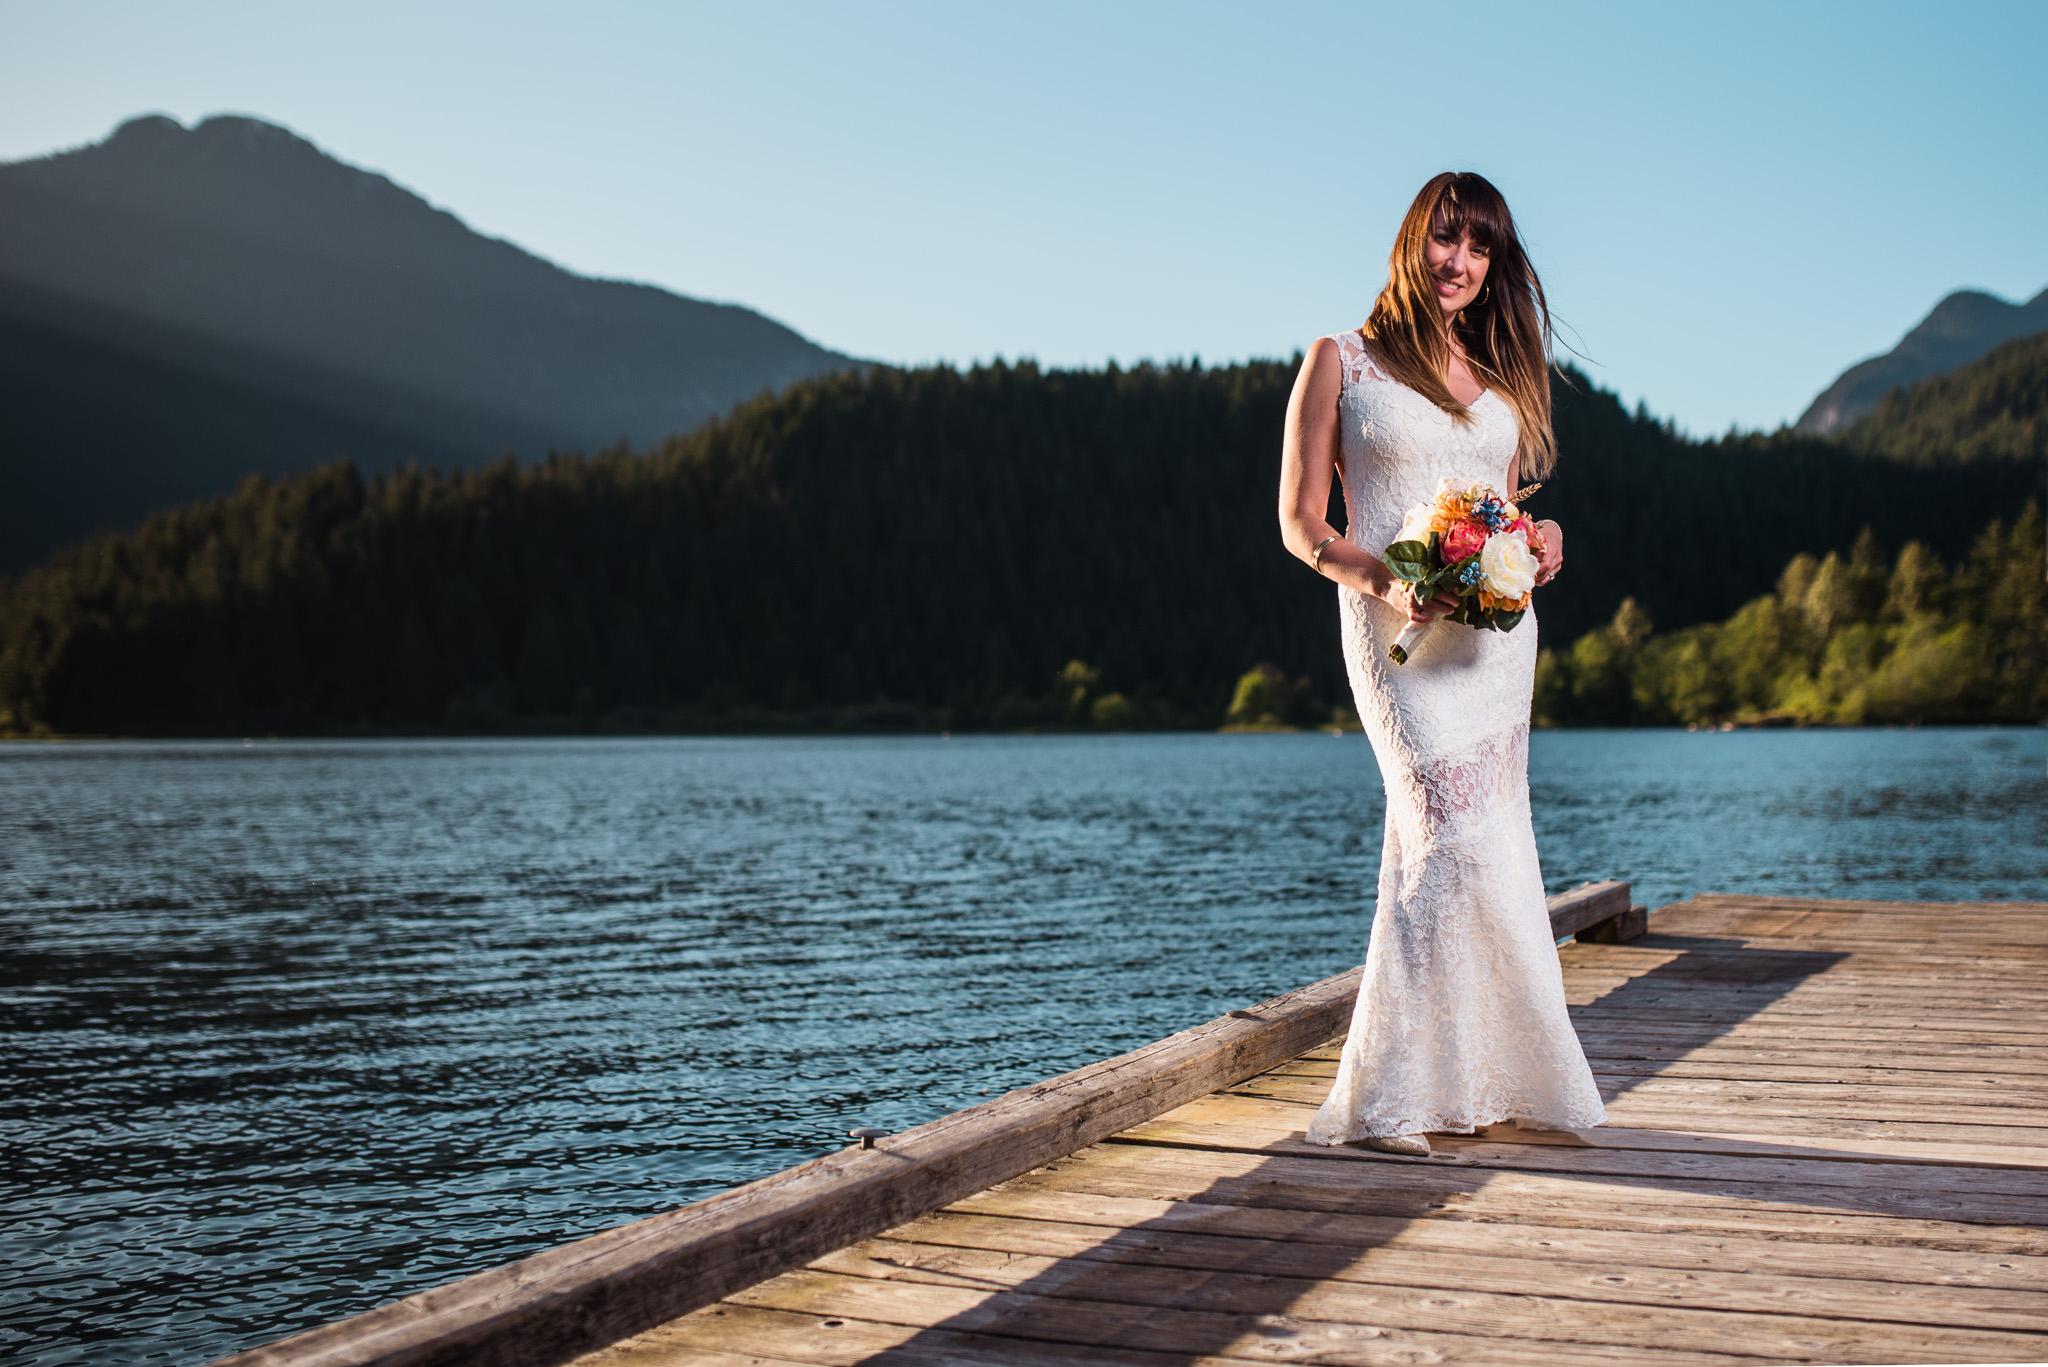 Melanie-Matt-Pitt-Lake-Post-Wedding-Shoot-Victoria-Wedding-Photographers-13.jpg